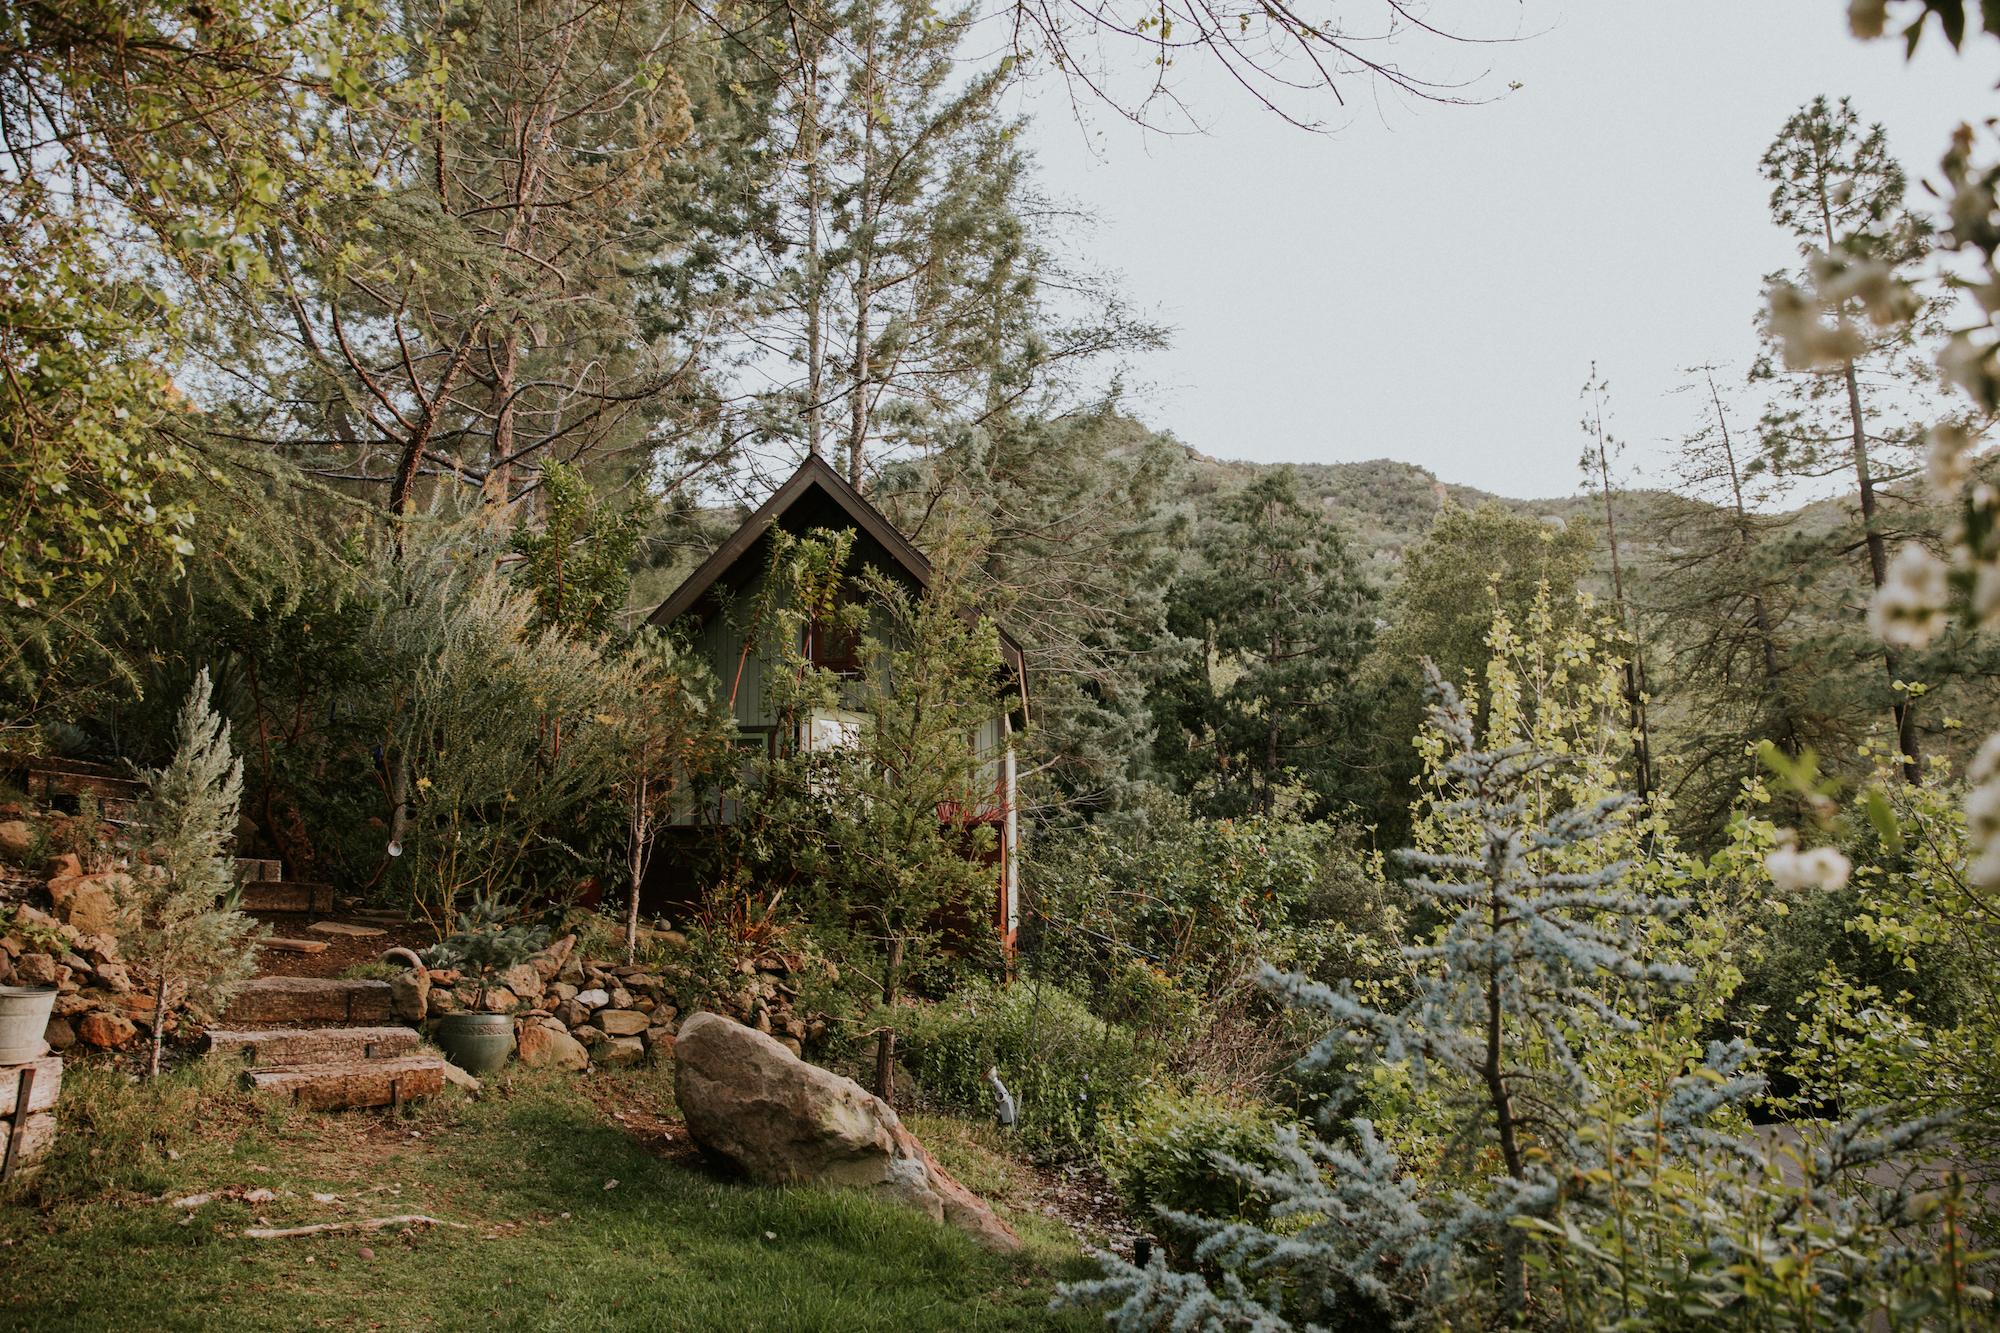 Malibu Airbnb